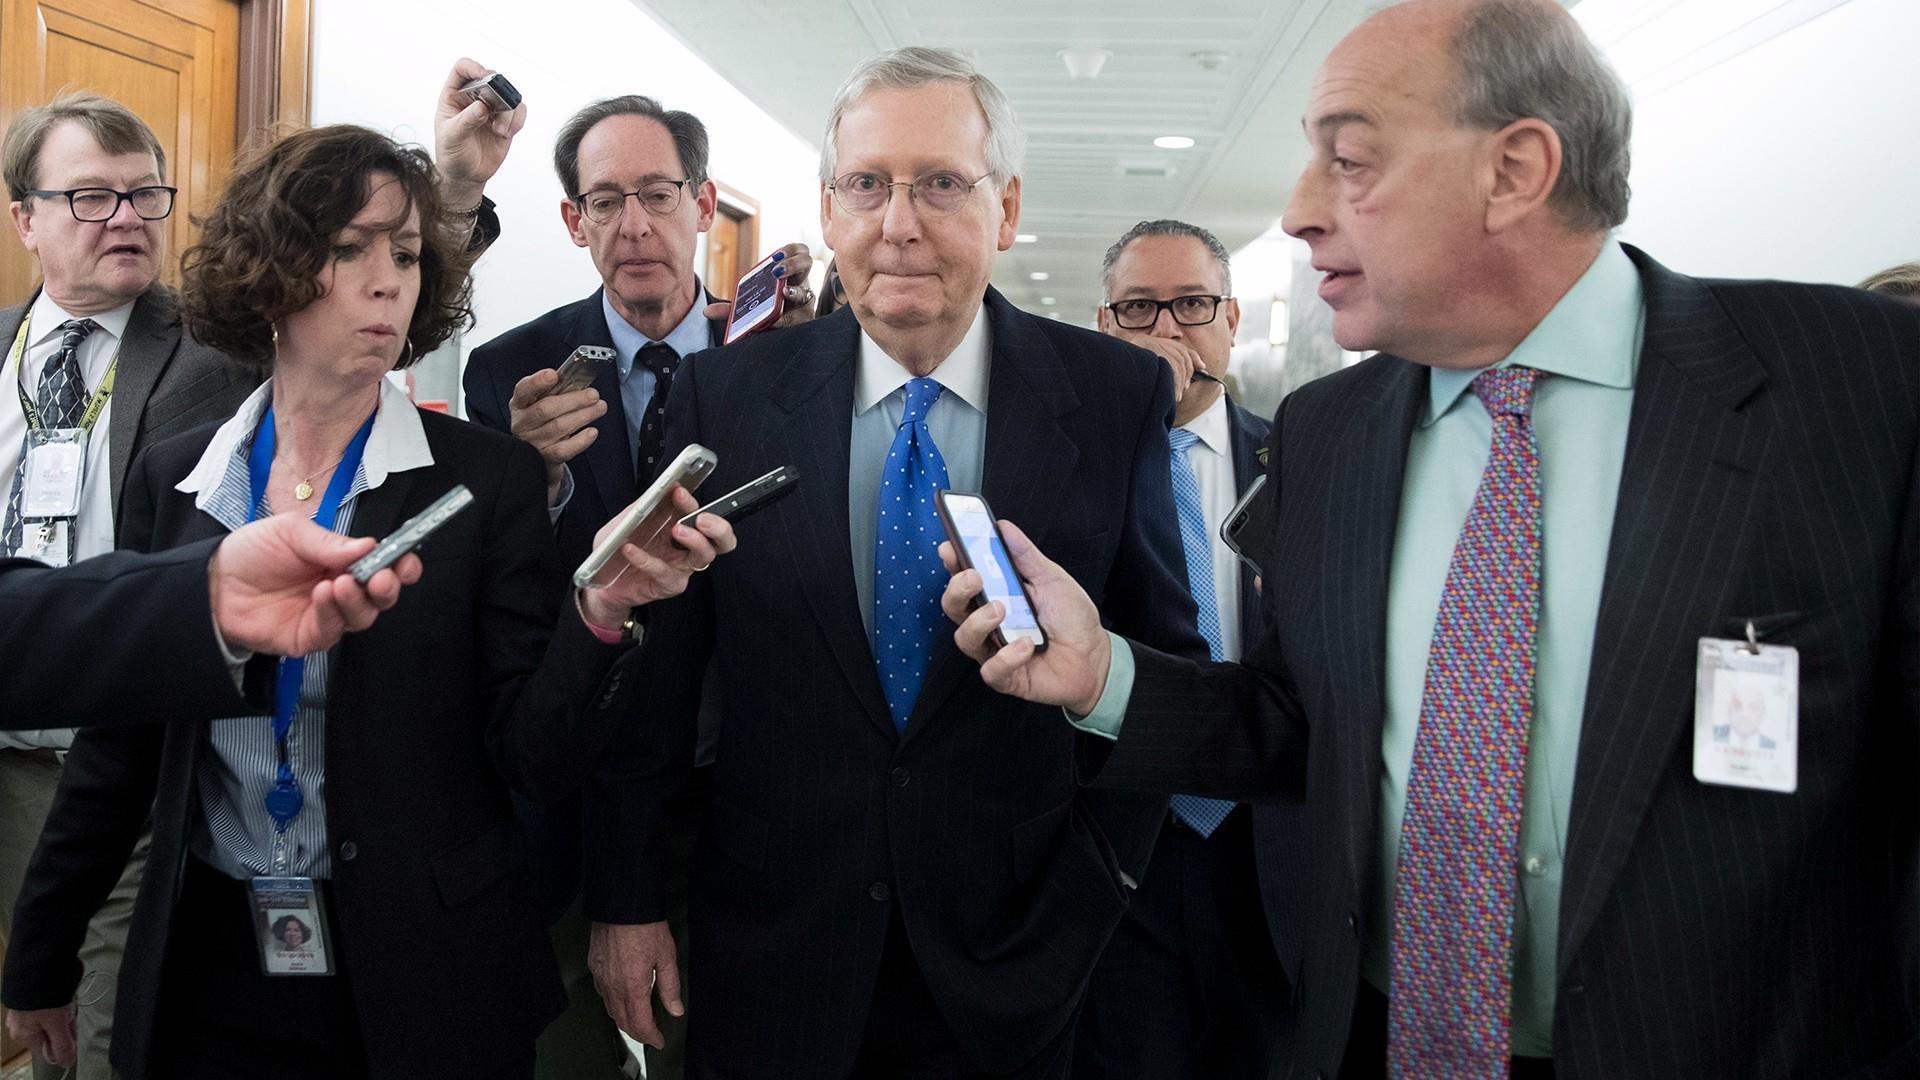 Senate debating tax cuts ahead of final...